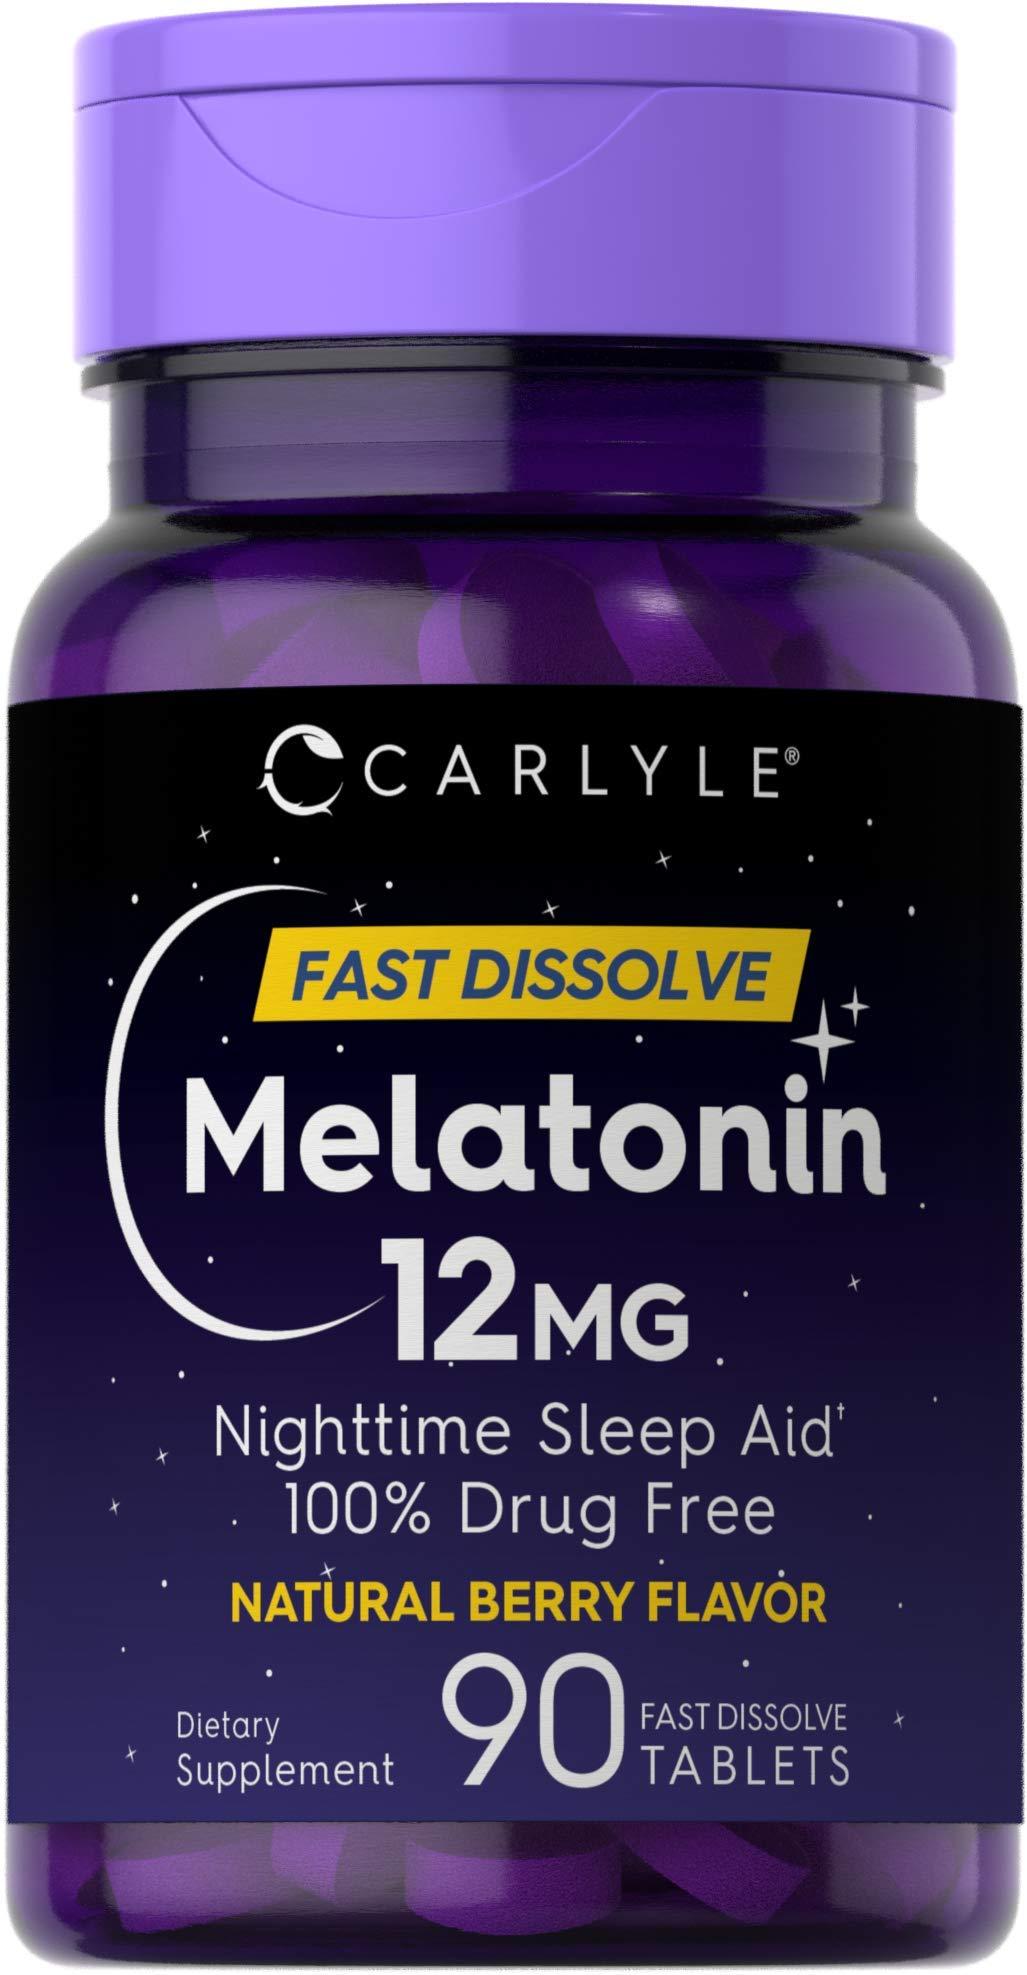 Carlyle Melatonin 12 mg Fast Dissolve 90 Tablets | Nighttime Sleep Aid | Natural Berry Flavor | Vegetarian, Non-GMO, Gluten Free